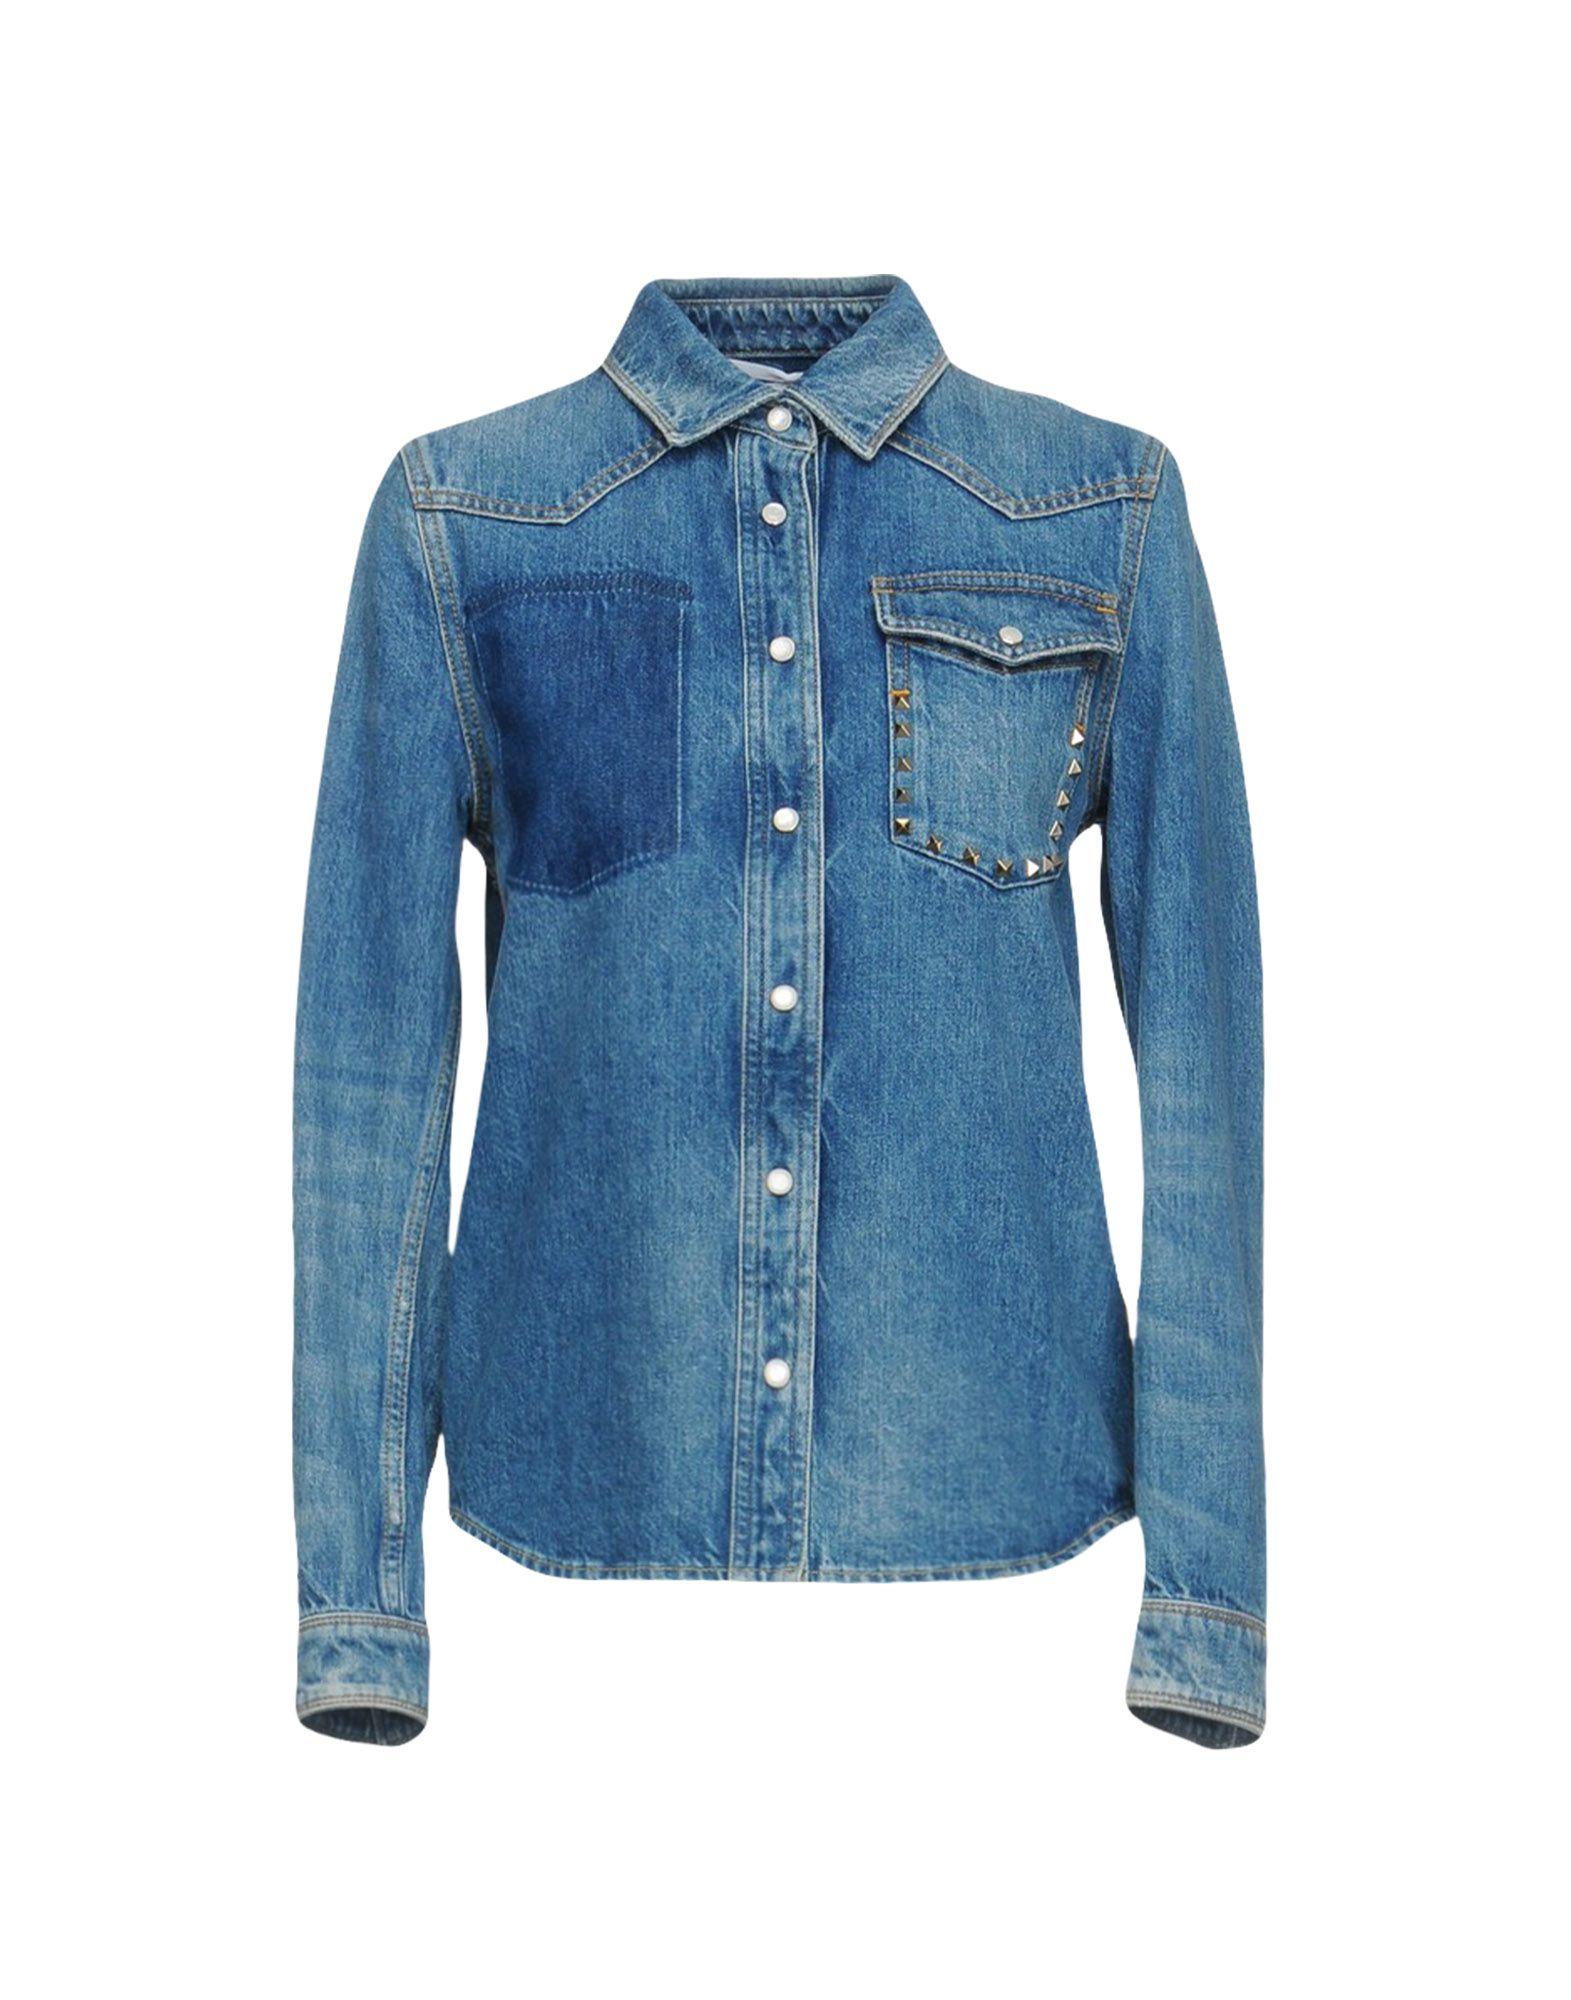 VALENTINO Джинсовая рубашка red valentino джинсовая крутка с кристаллами и аппликациями